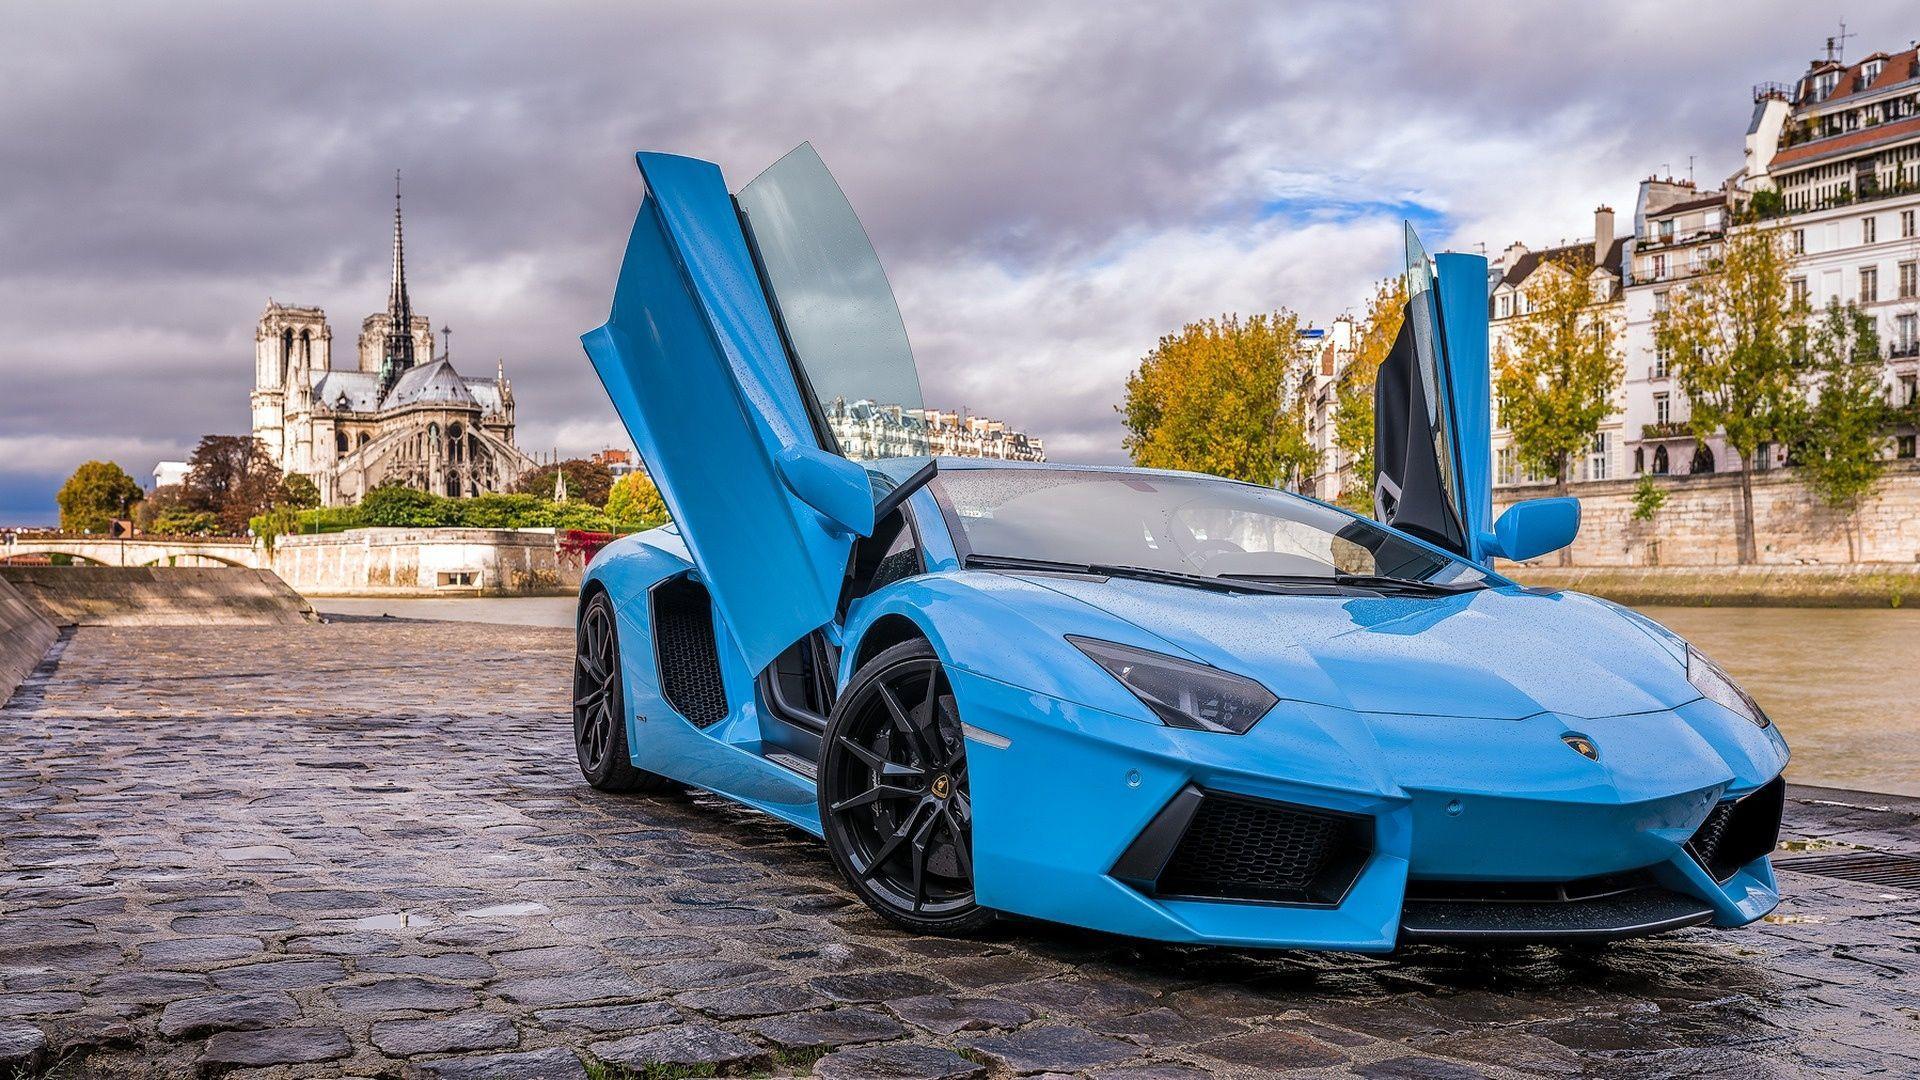 Blue Lamborghini Aventador Wallpapers Top Free Blue Lamborghini Aventador Backgrounds Wallpaperaccess